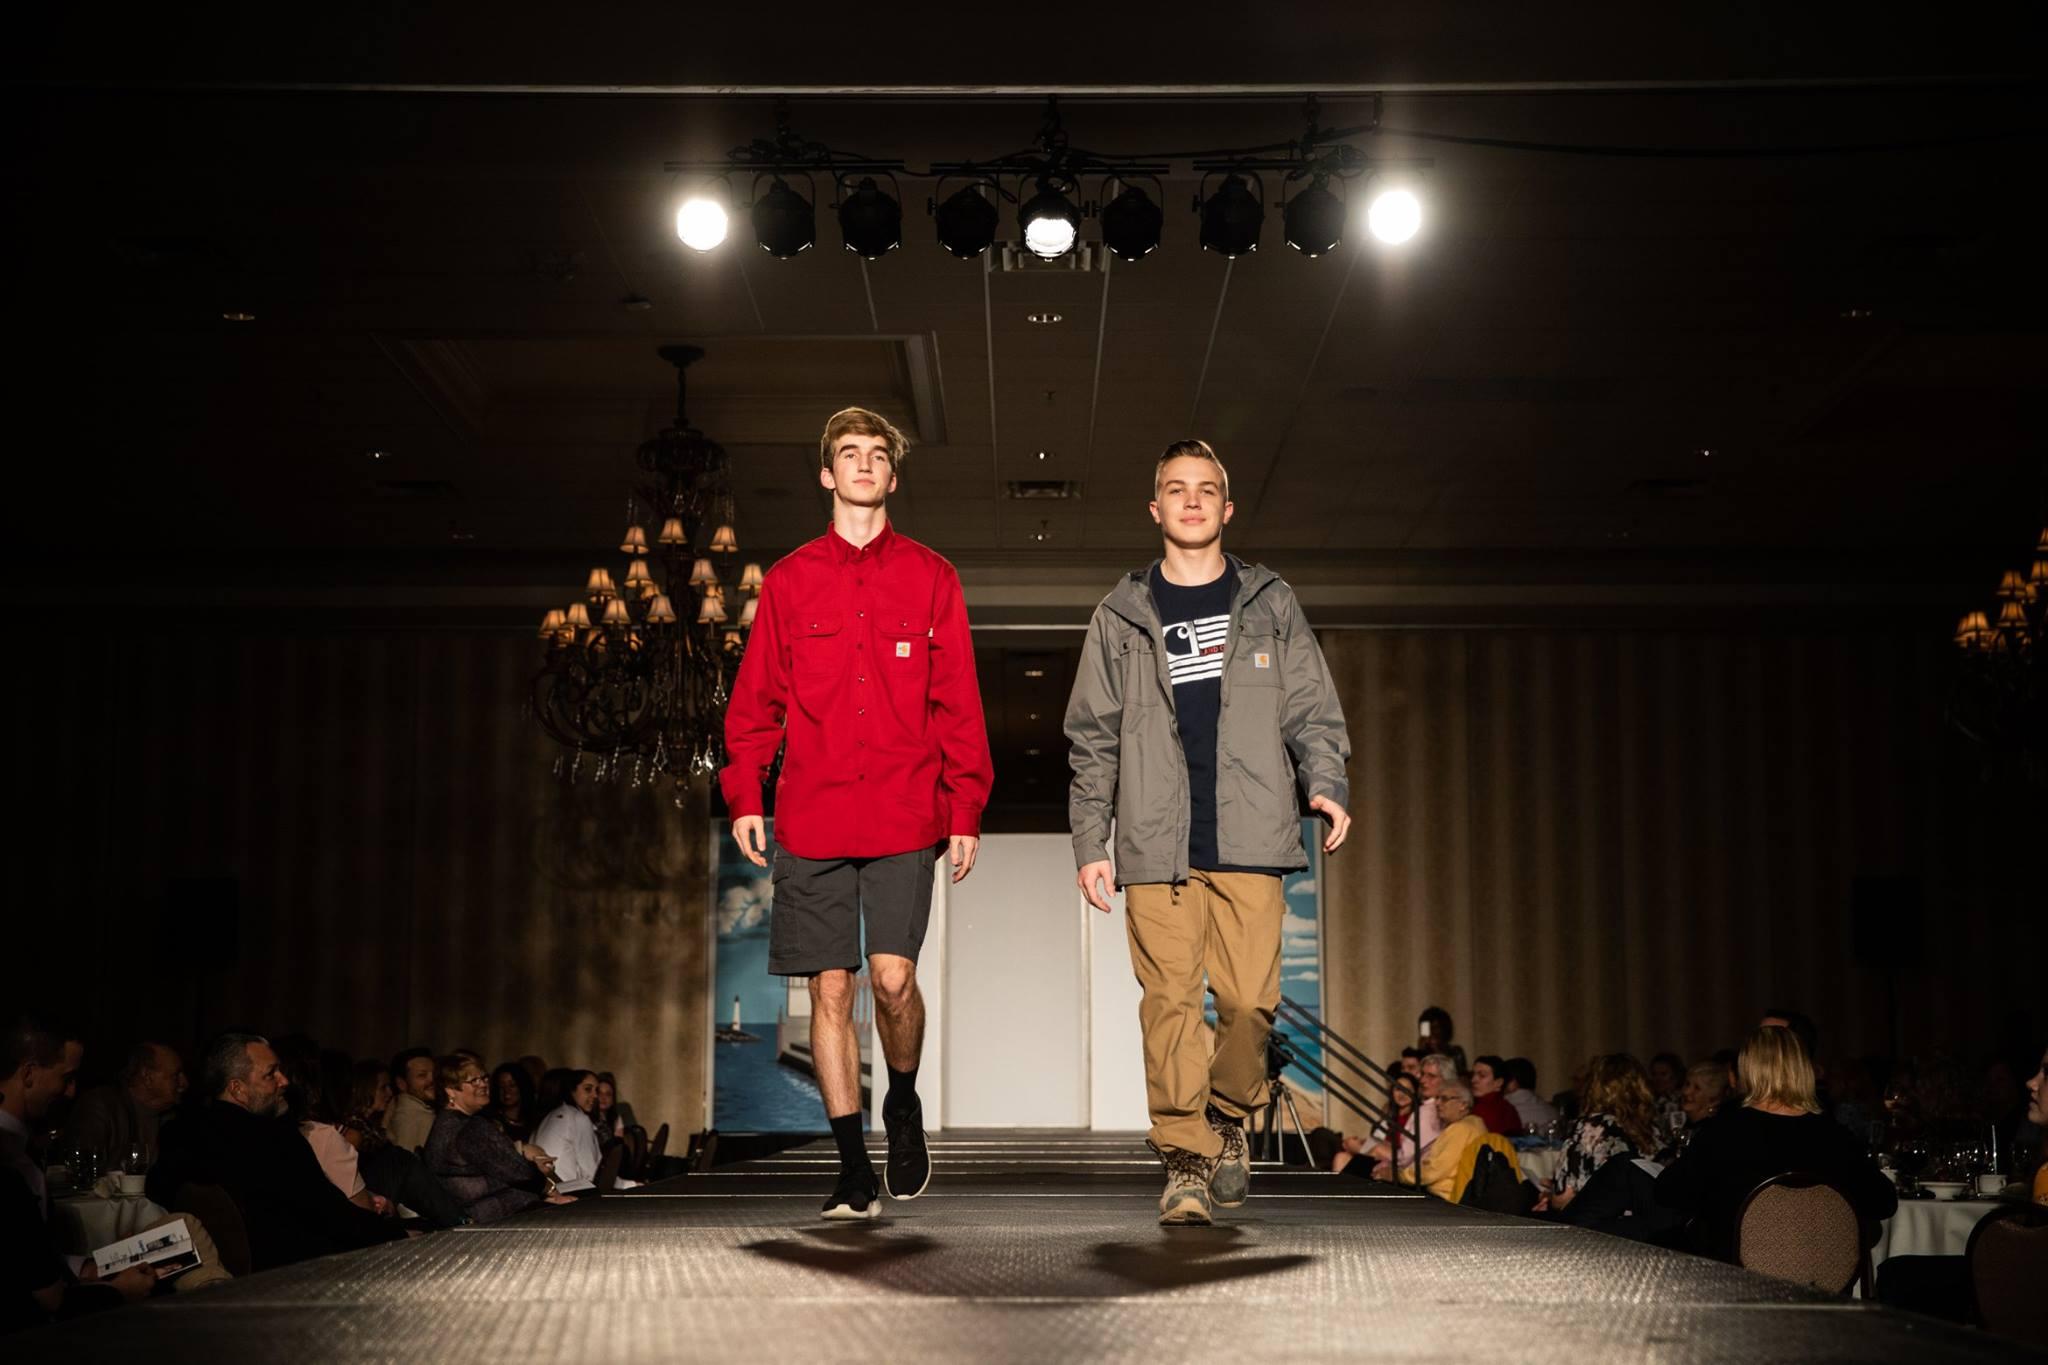 Lutheran_North_High_School_Macomb_Michigan_LHN_Fashion_Show_2019 (12).jpg